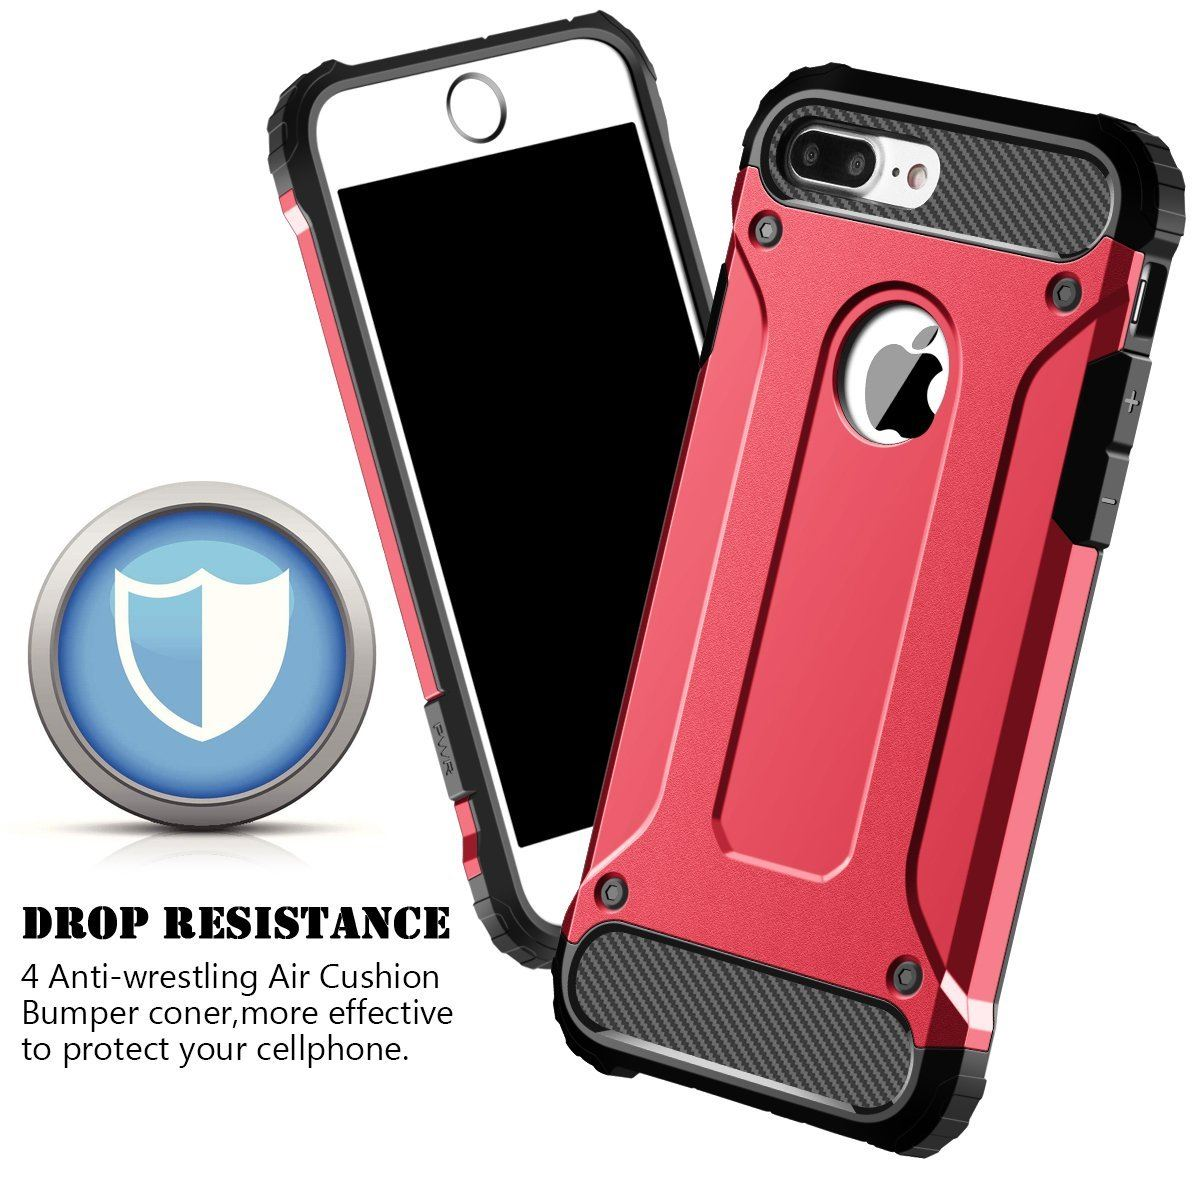 thumbnail 26 - For Apple iPhone 11 Pro Max XR Xs X 8 7 Plus 6 5 Se Case Cover Tough Armor